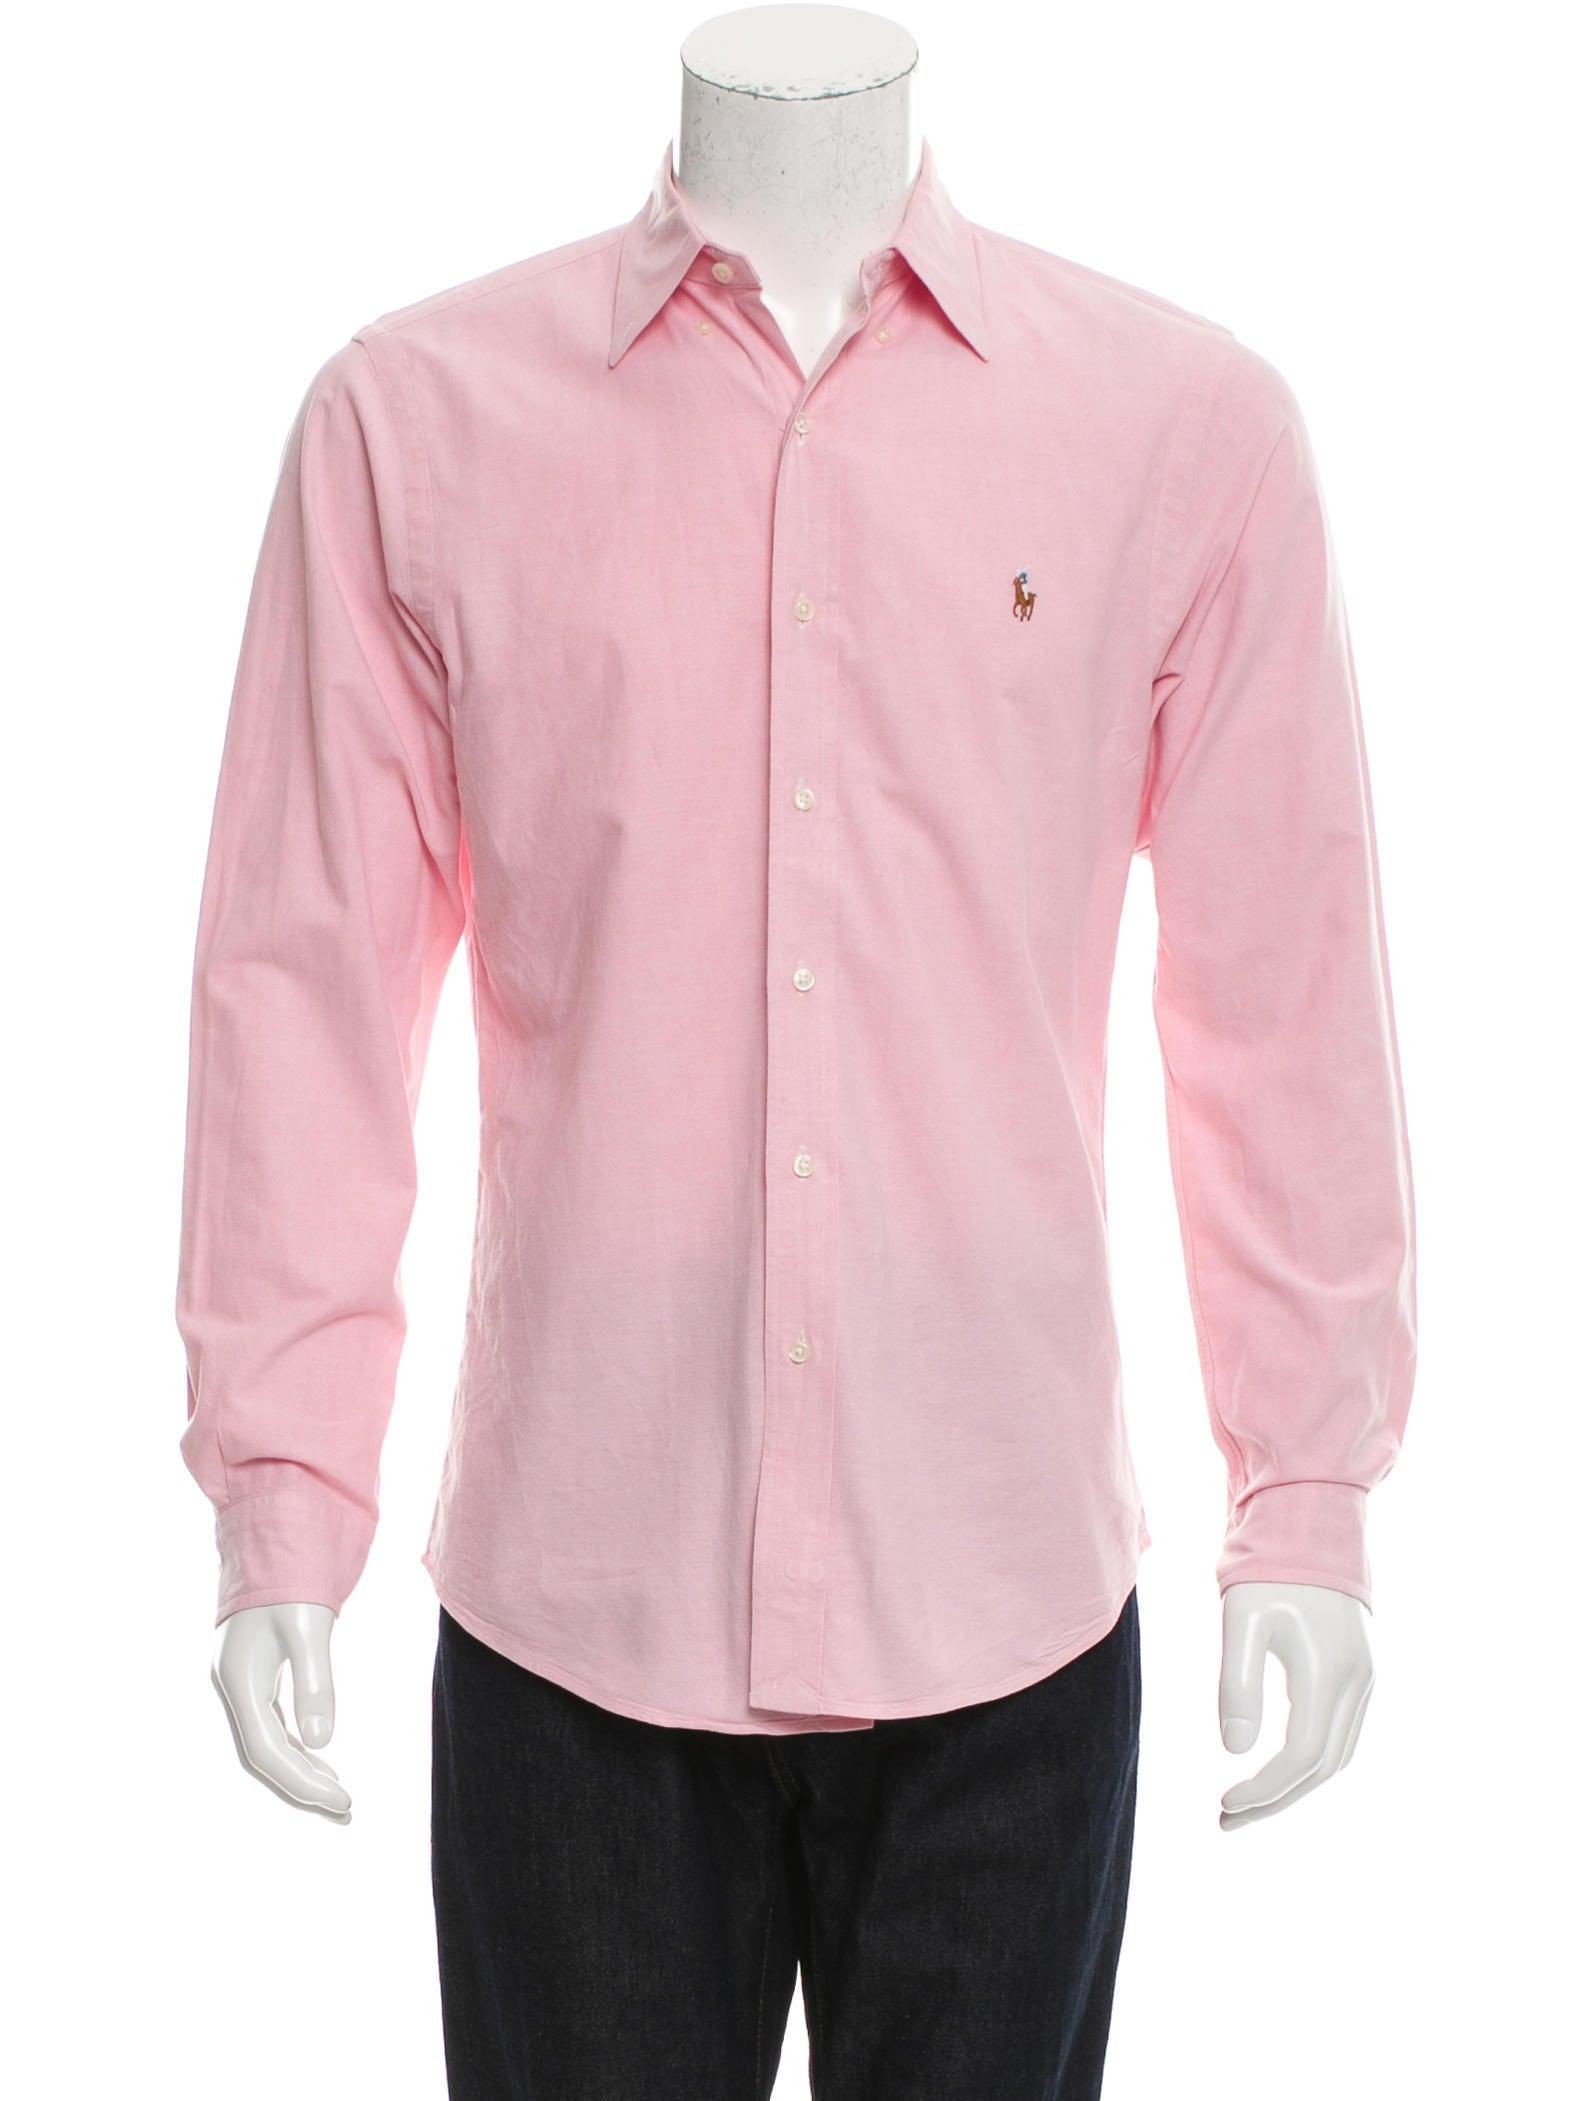 Shop Hudson's Bay for the latest in dress shirts from Ralph Lauren, Dress-Up & Pretend Play; Long-Sleeve Button-Down Dress Shirt $ Designer.